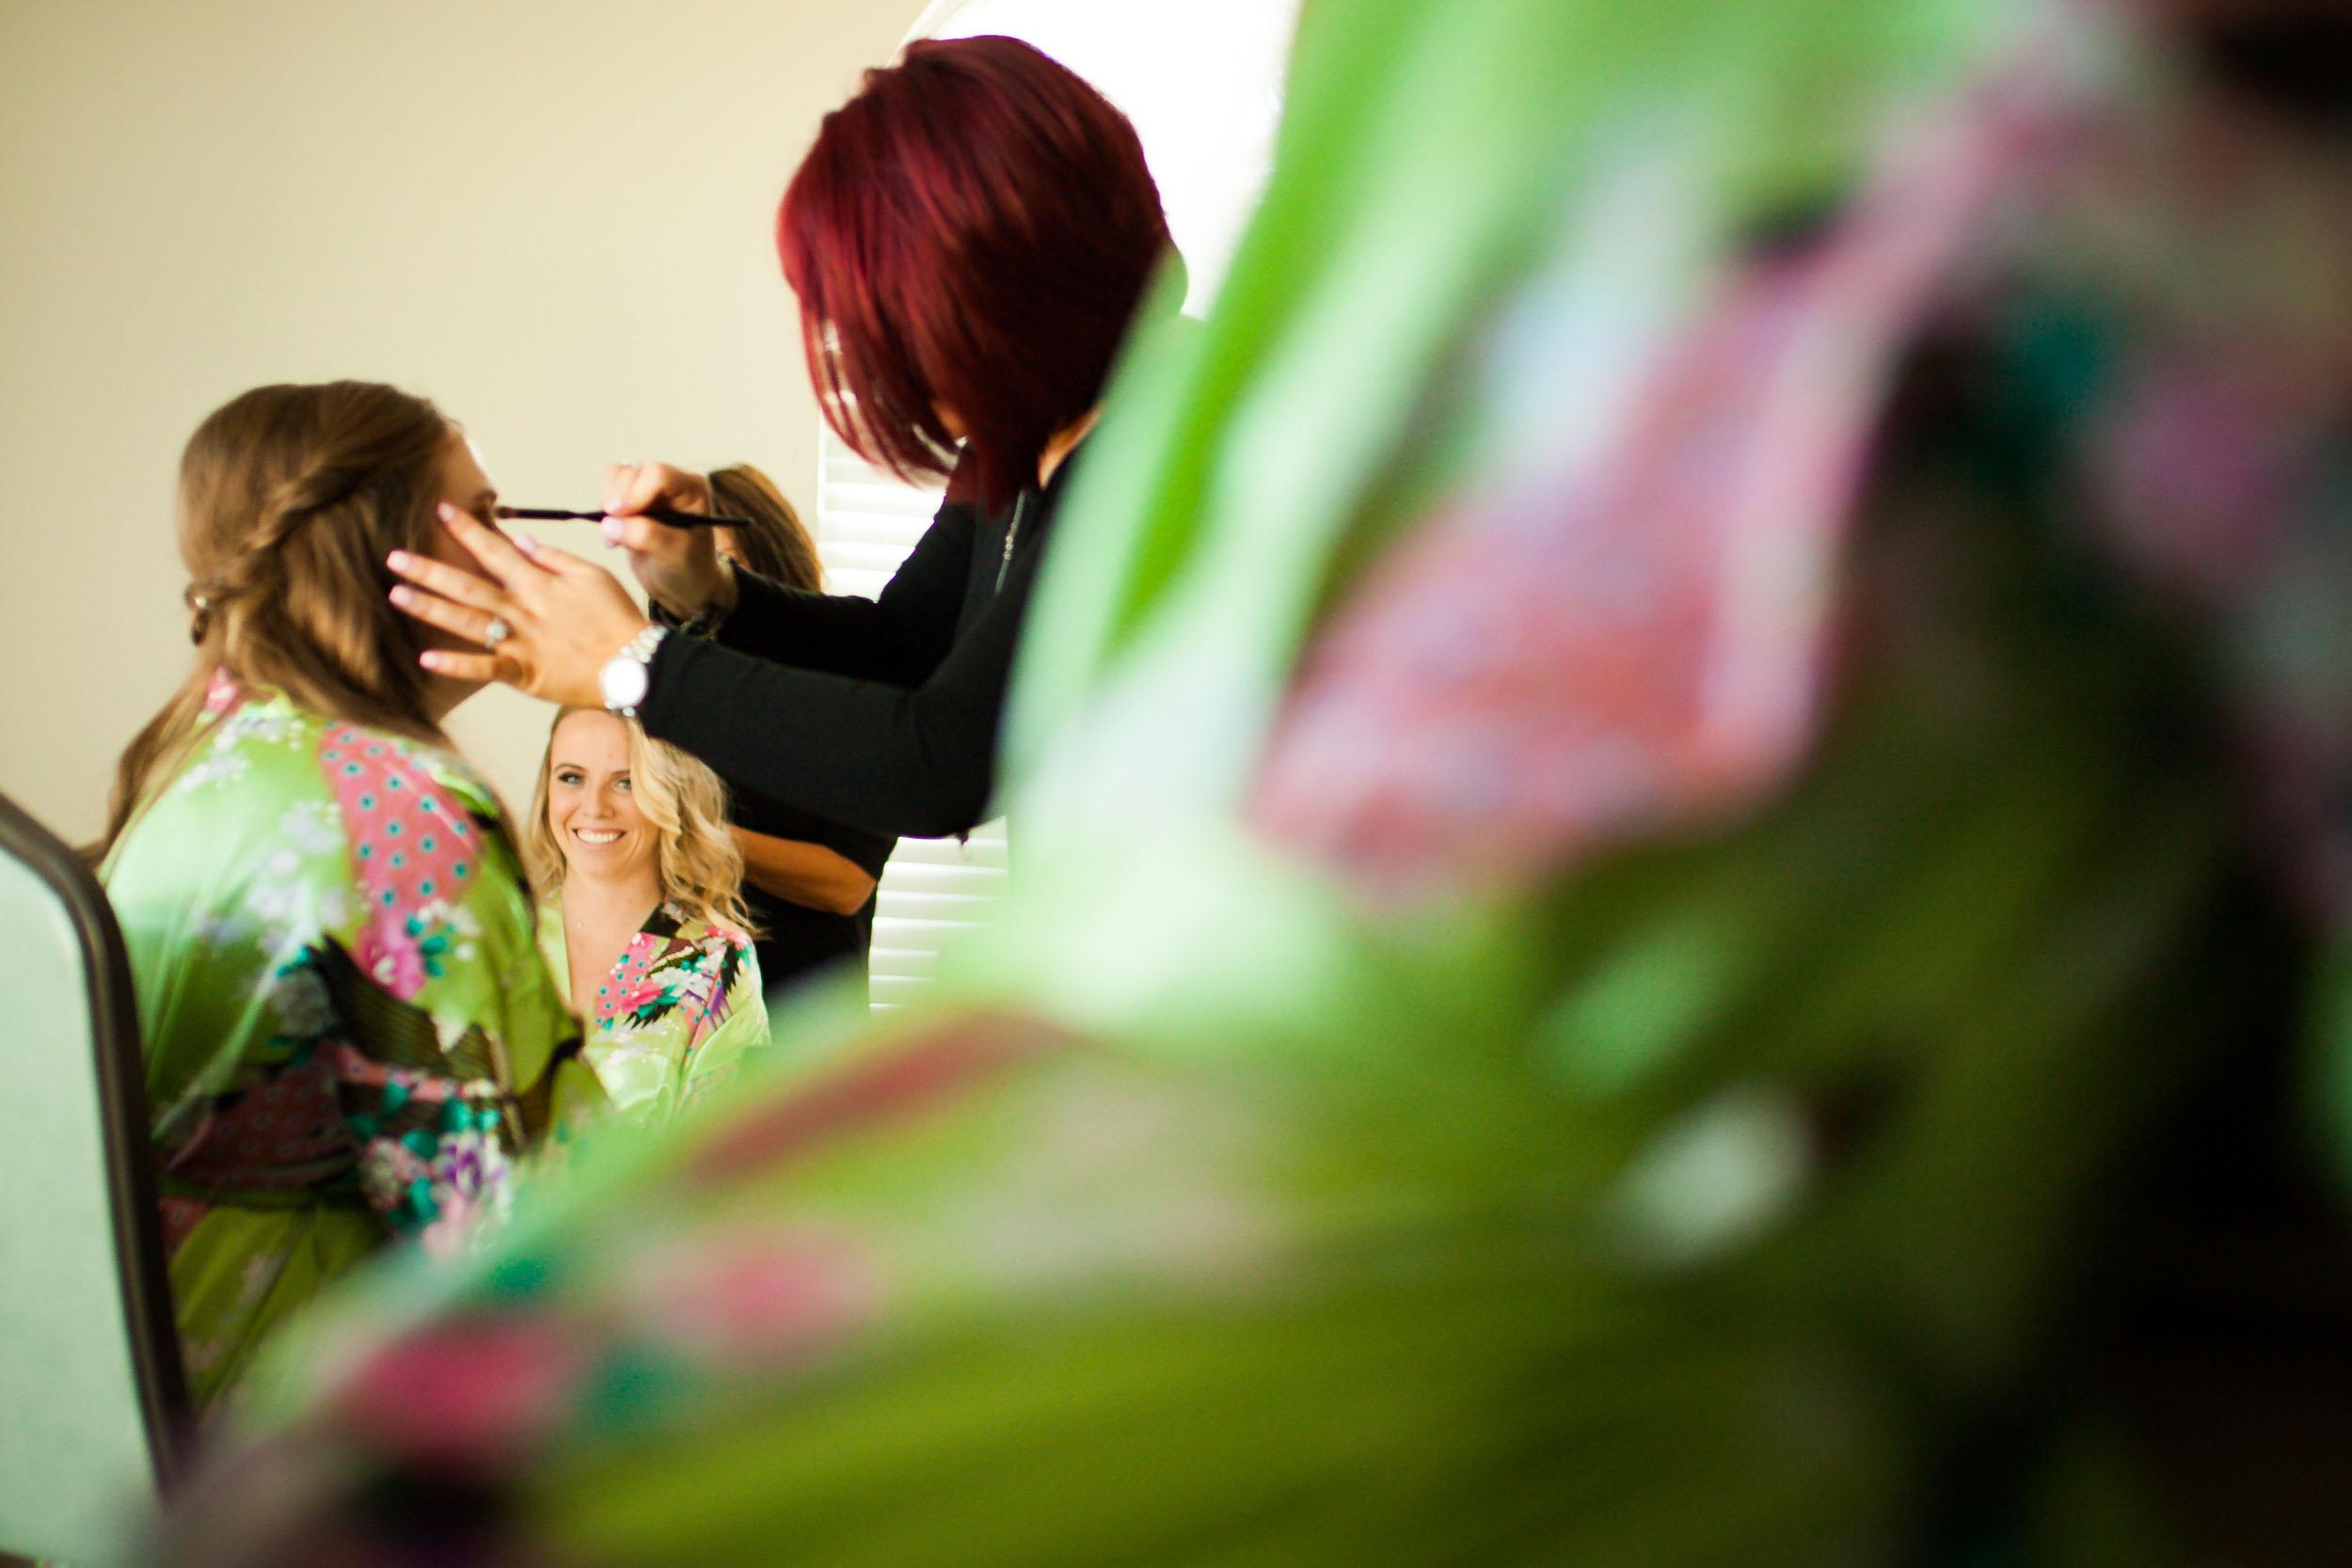 Flordia-Wedding-Photography-8.jpg